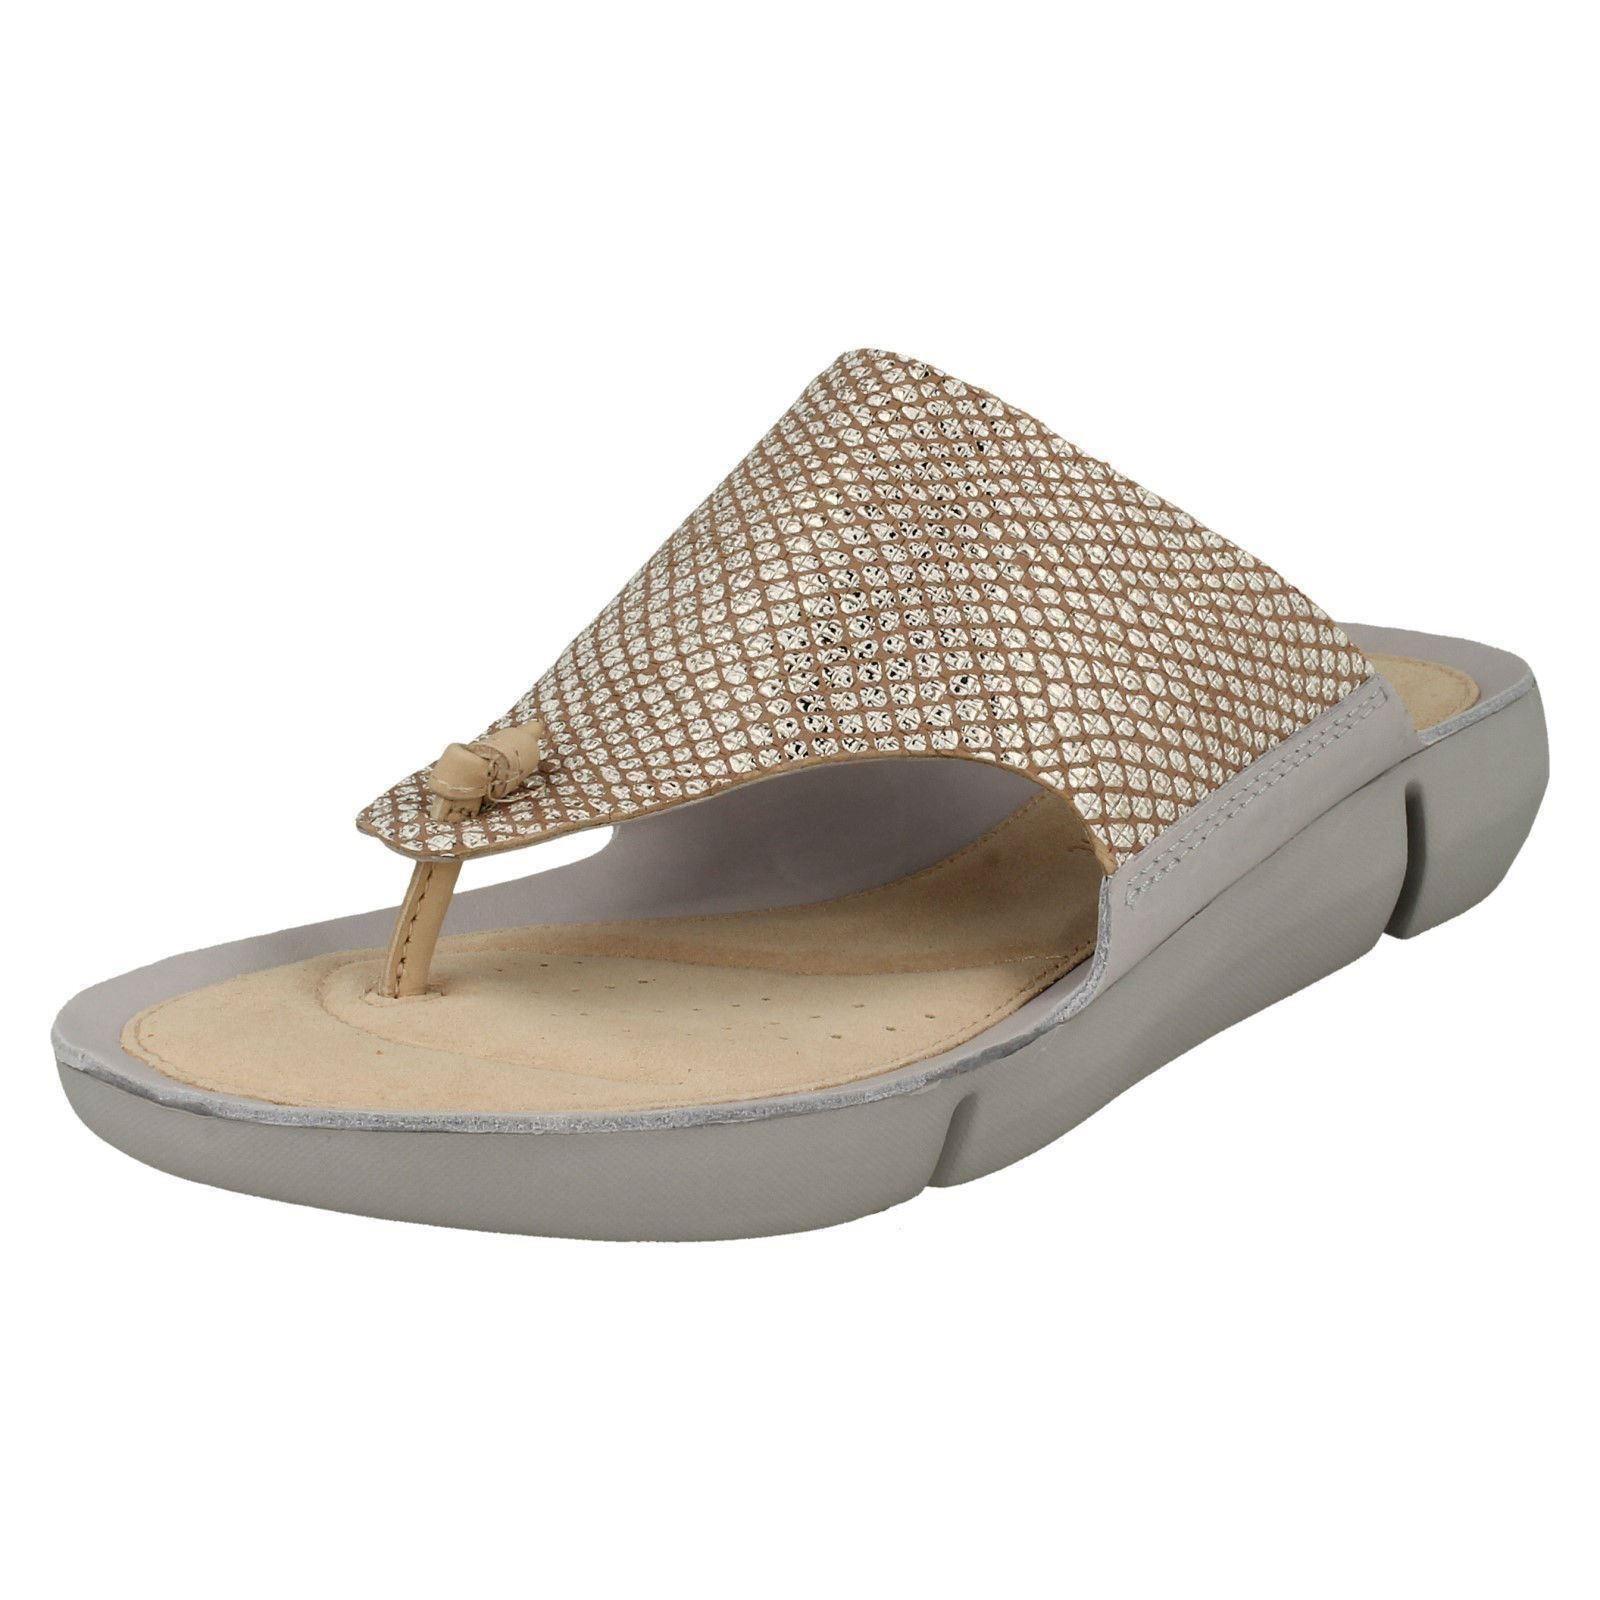 Ladies Clarks Tri Carmen Metallic Leather Toe Post Mule Sandals - D Fitting